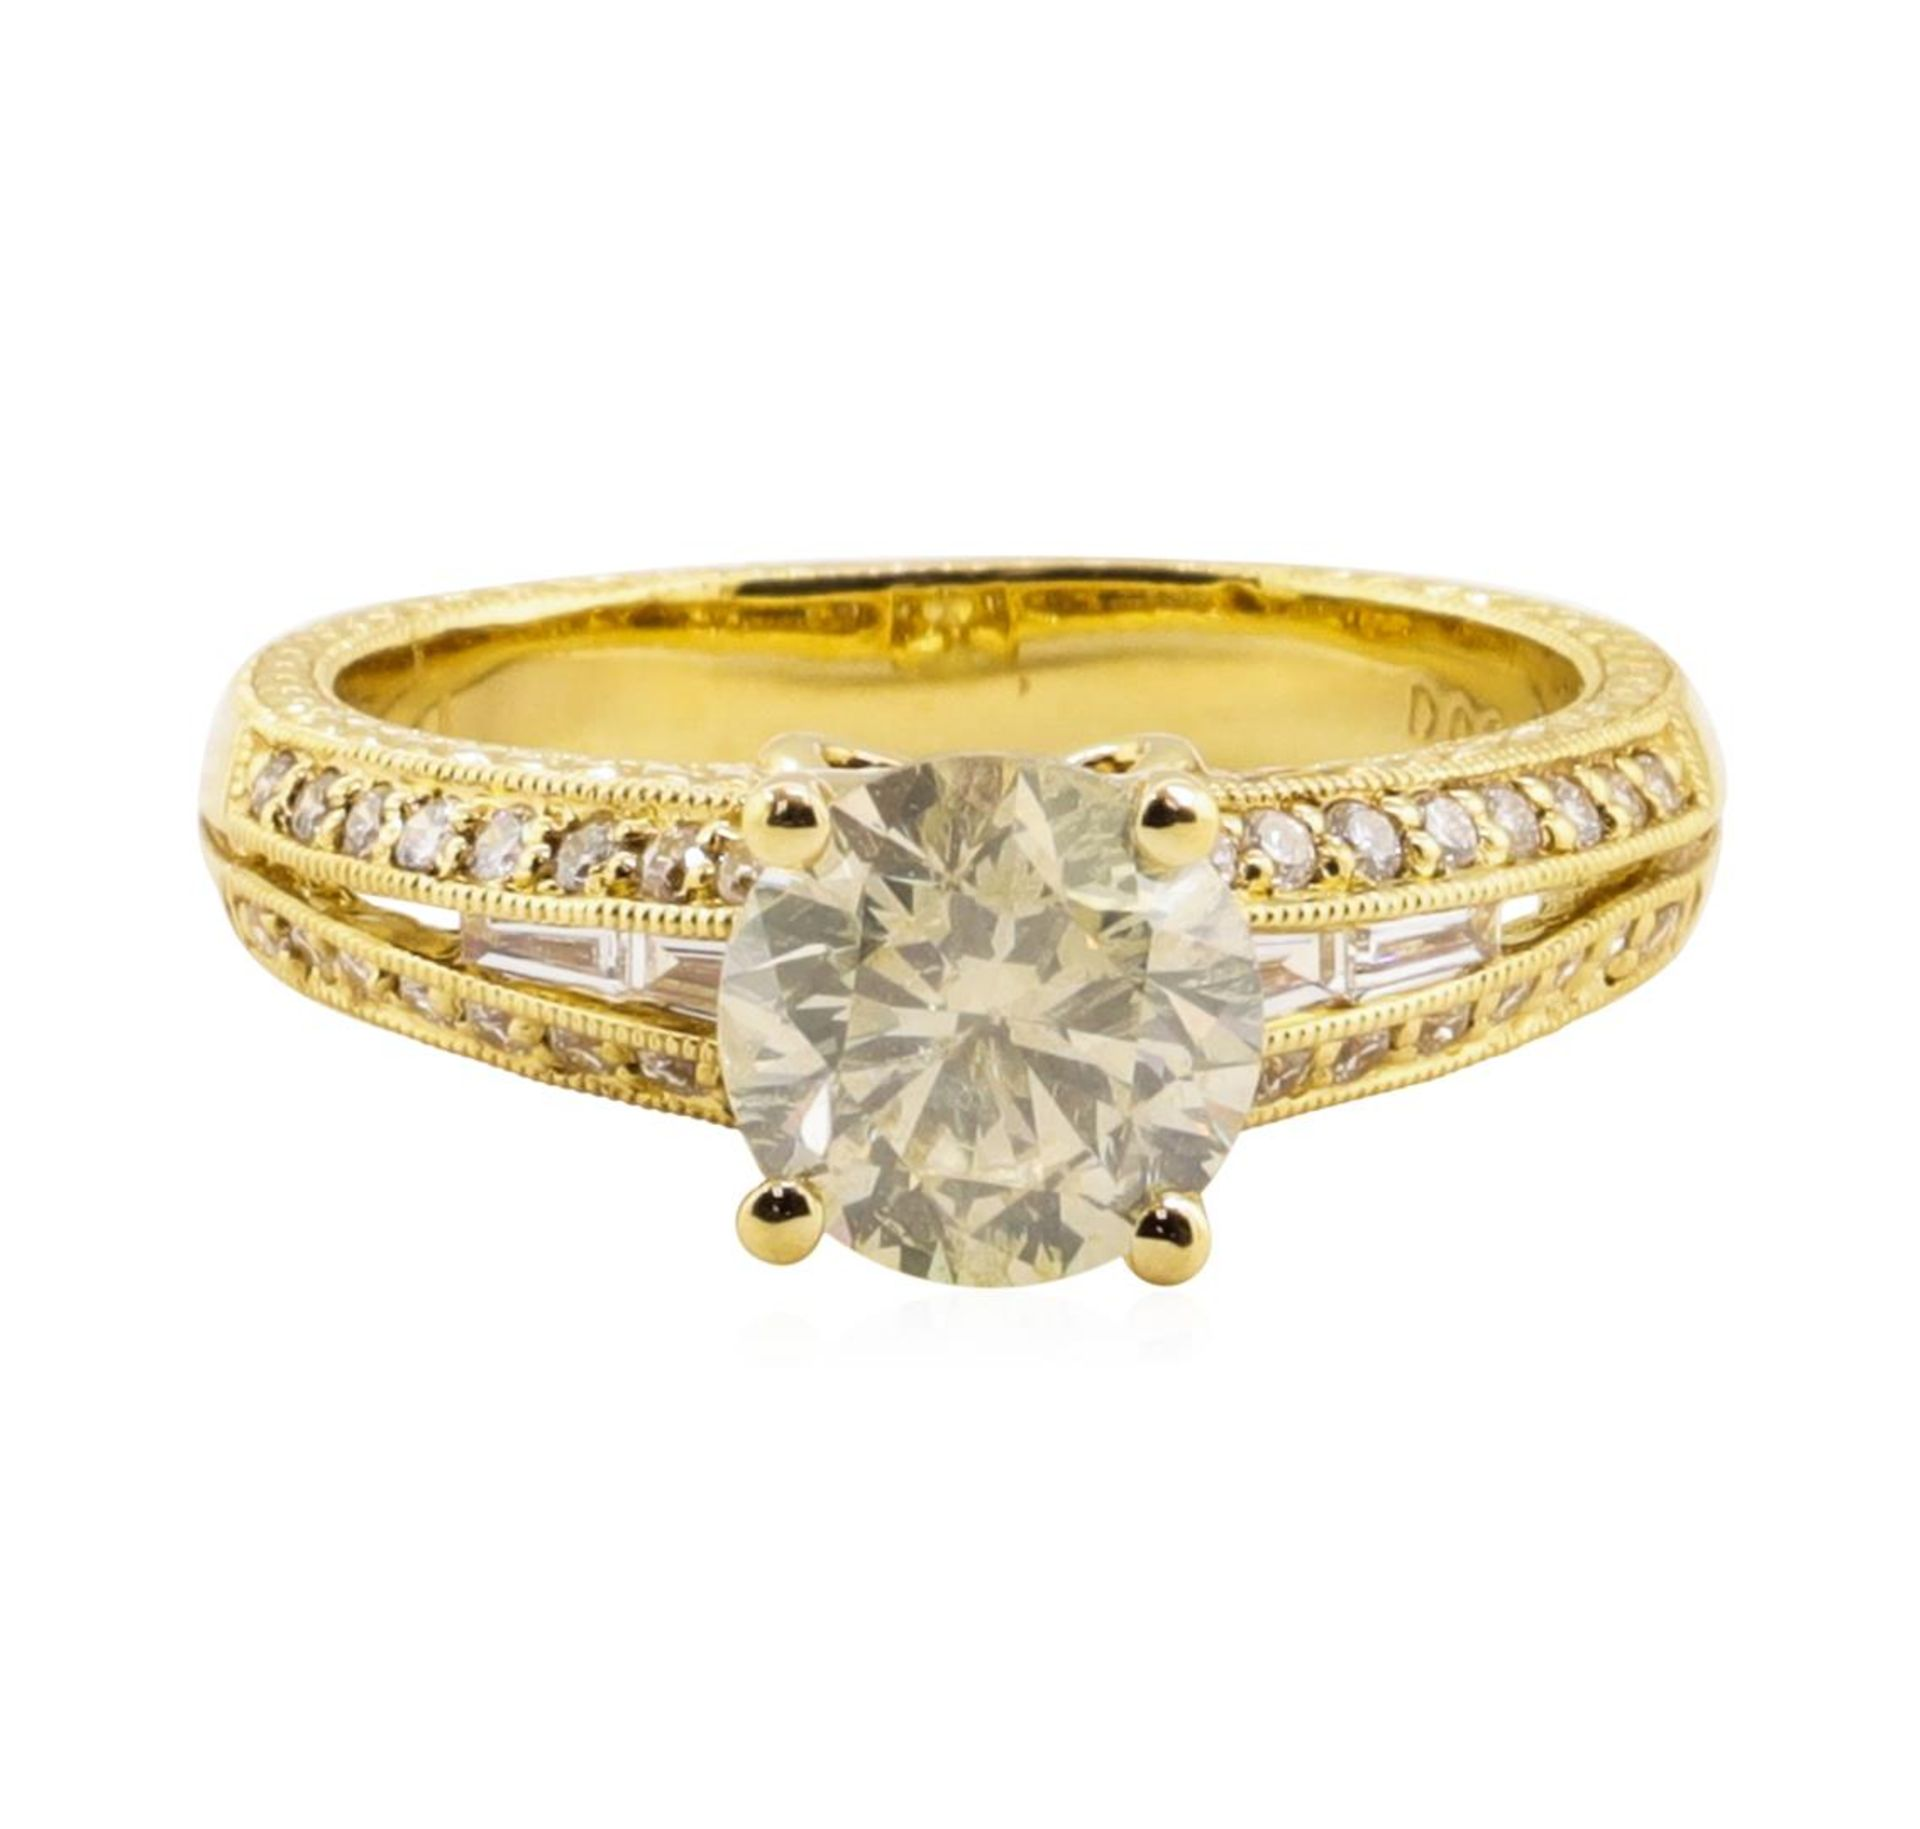 1.67ct Diamond Ring - 18KT Yellow Gold